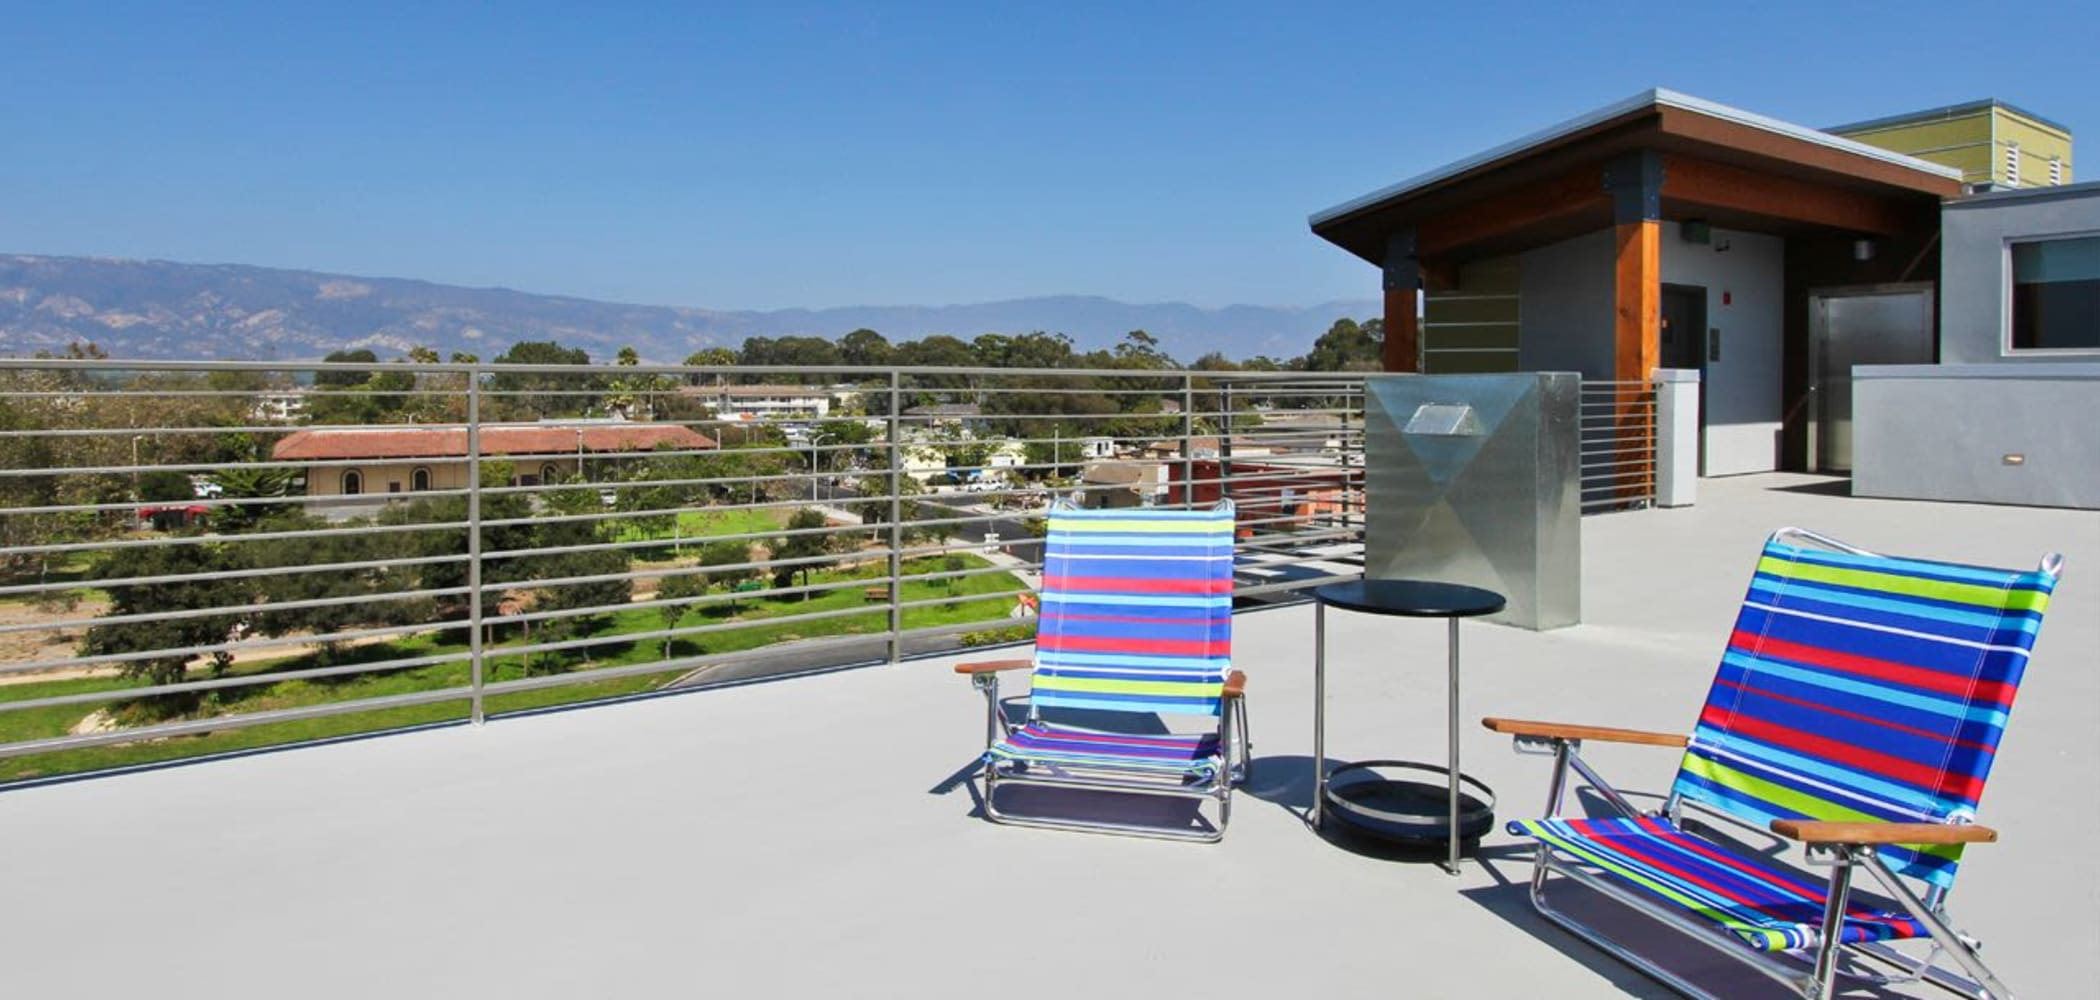 Outdoor rooftop lounge at ICONin Isla Vista, California